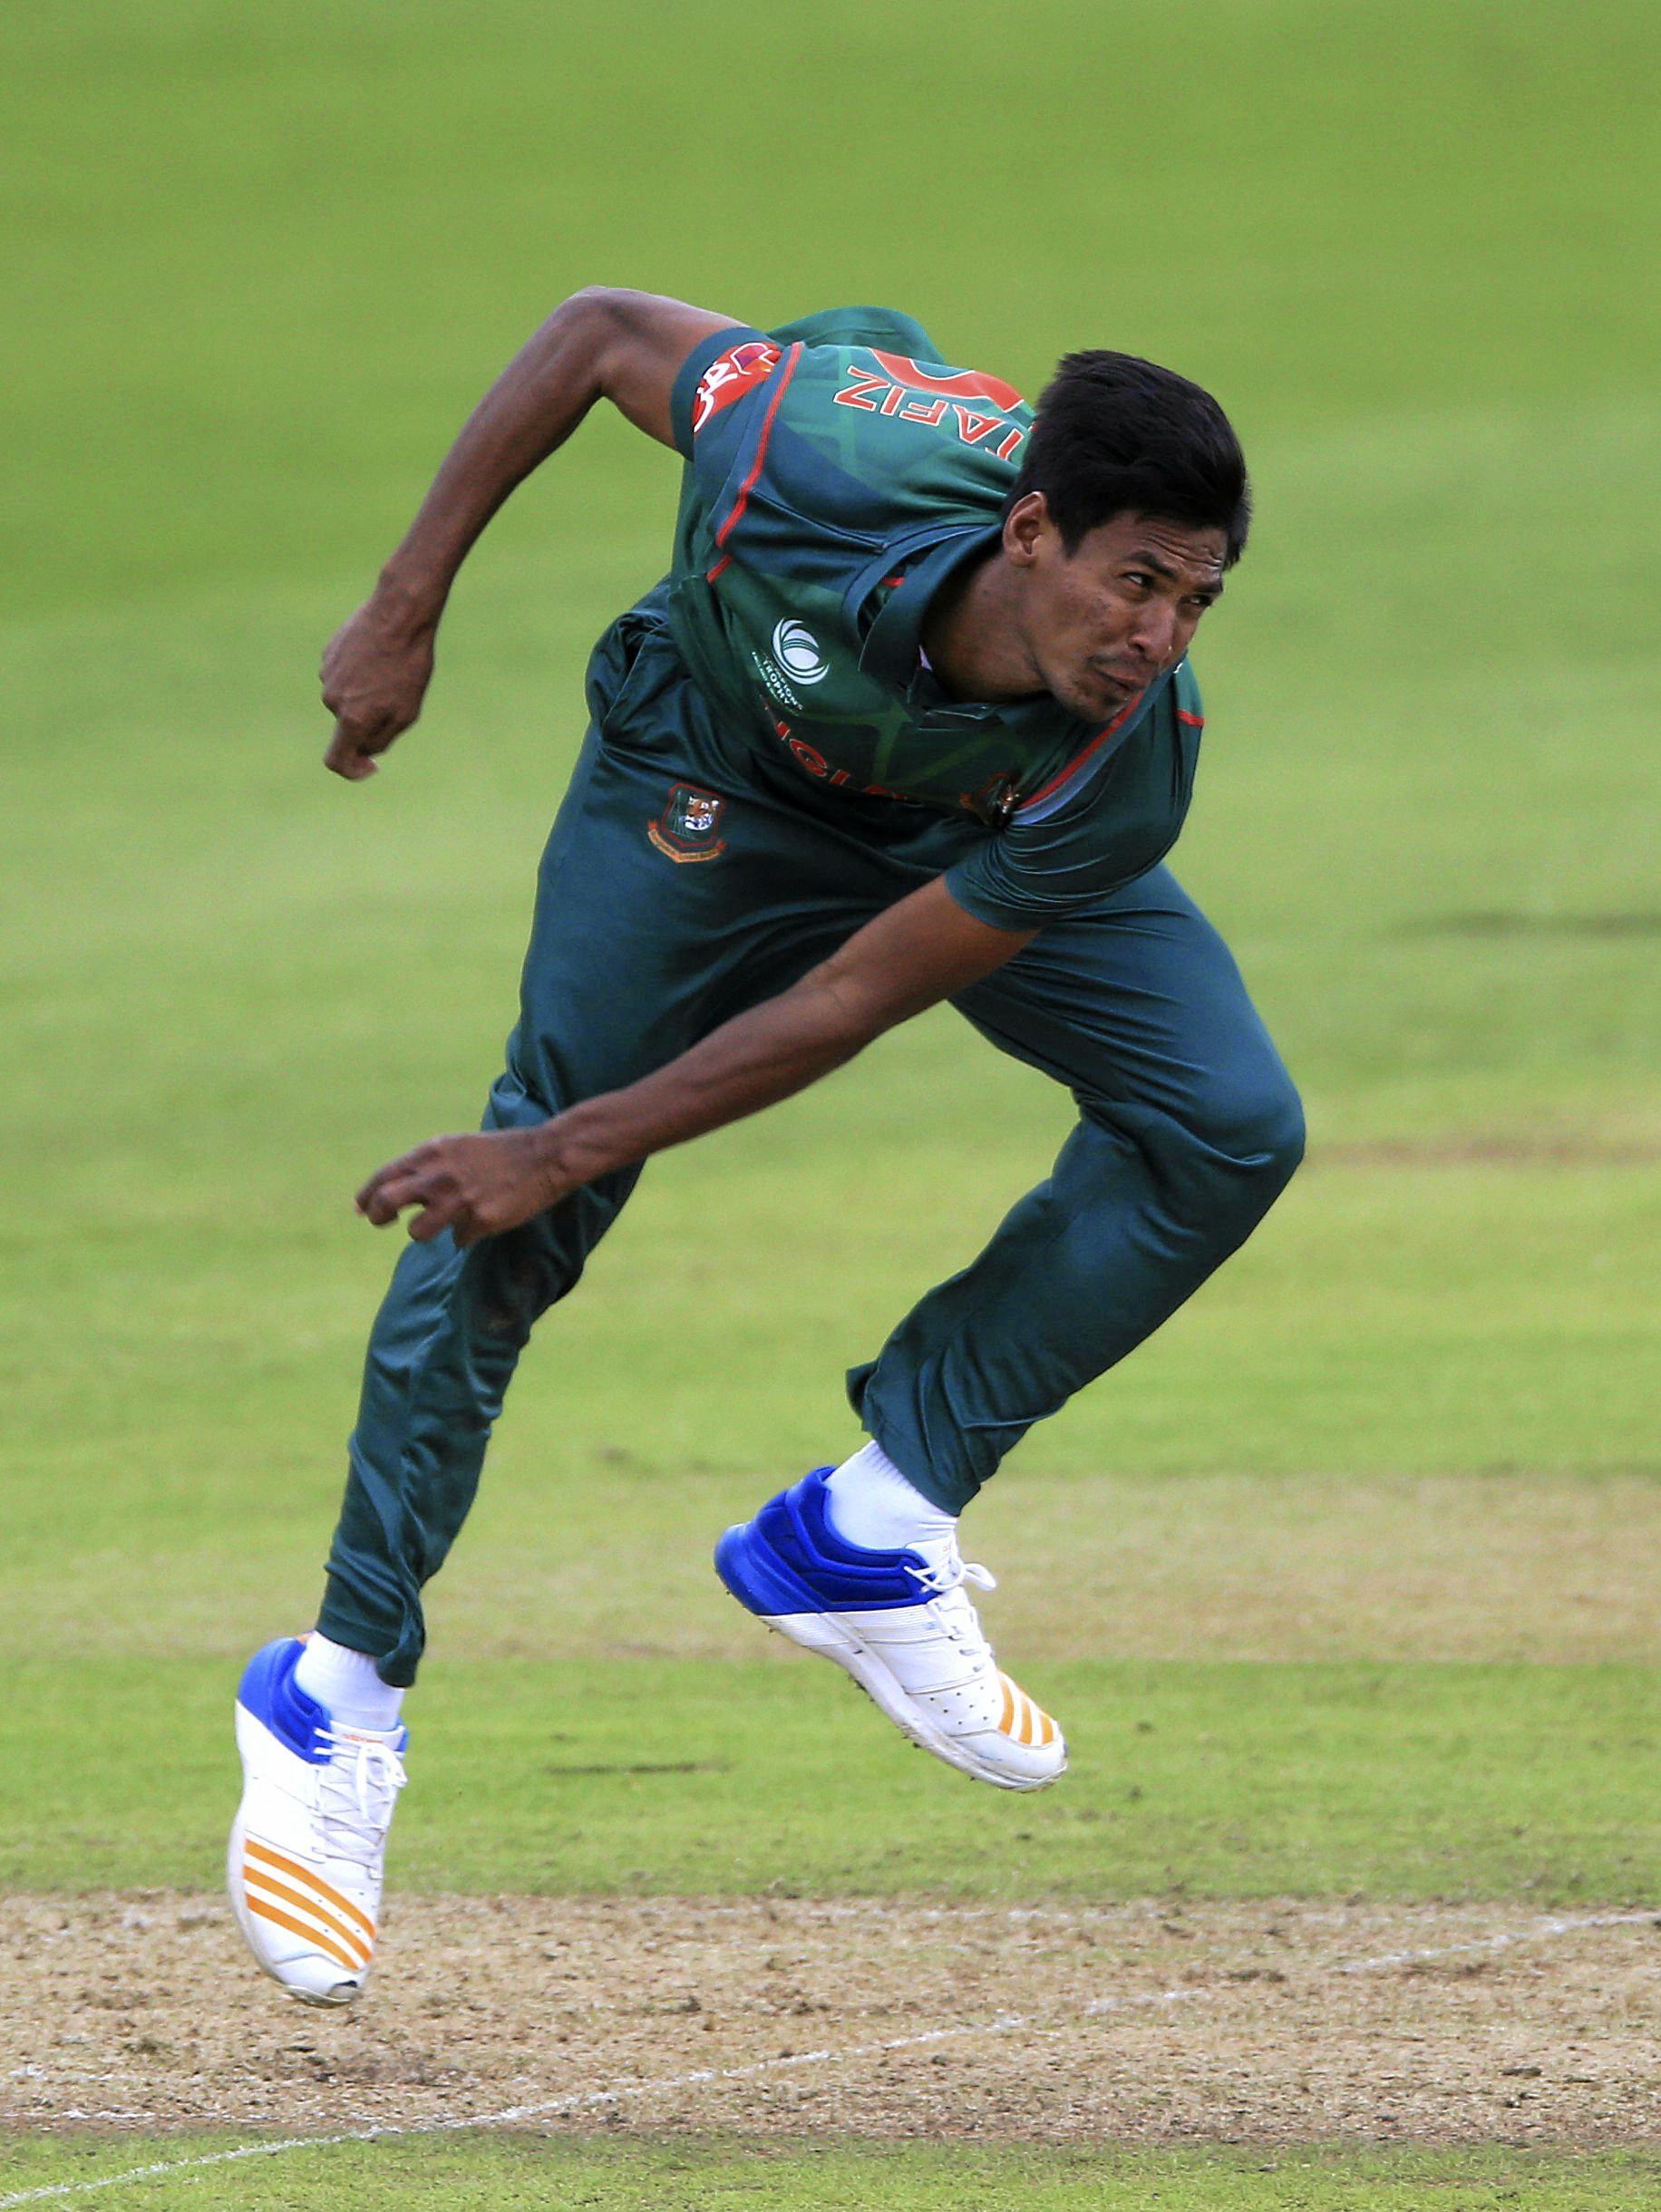 Bangladesh's Mustafizur Rahman bowls during the ICC Champions Trophy in June.